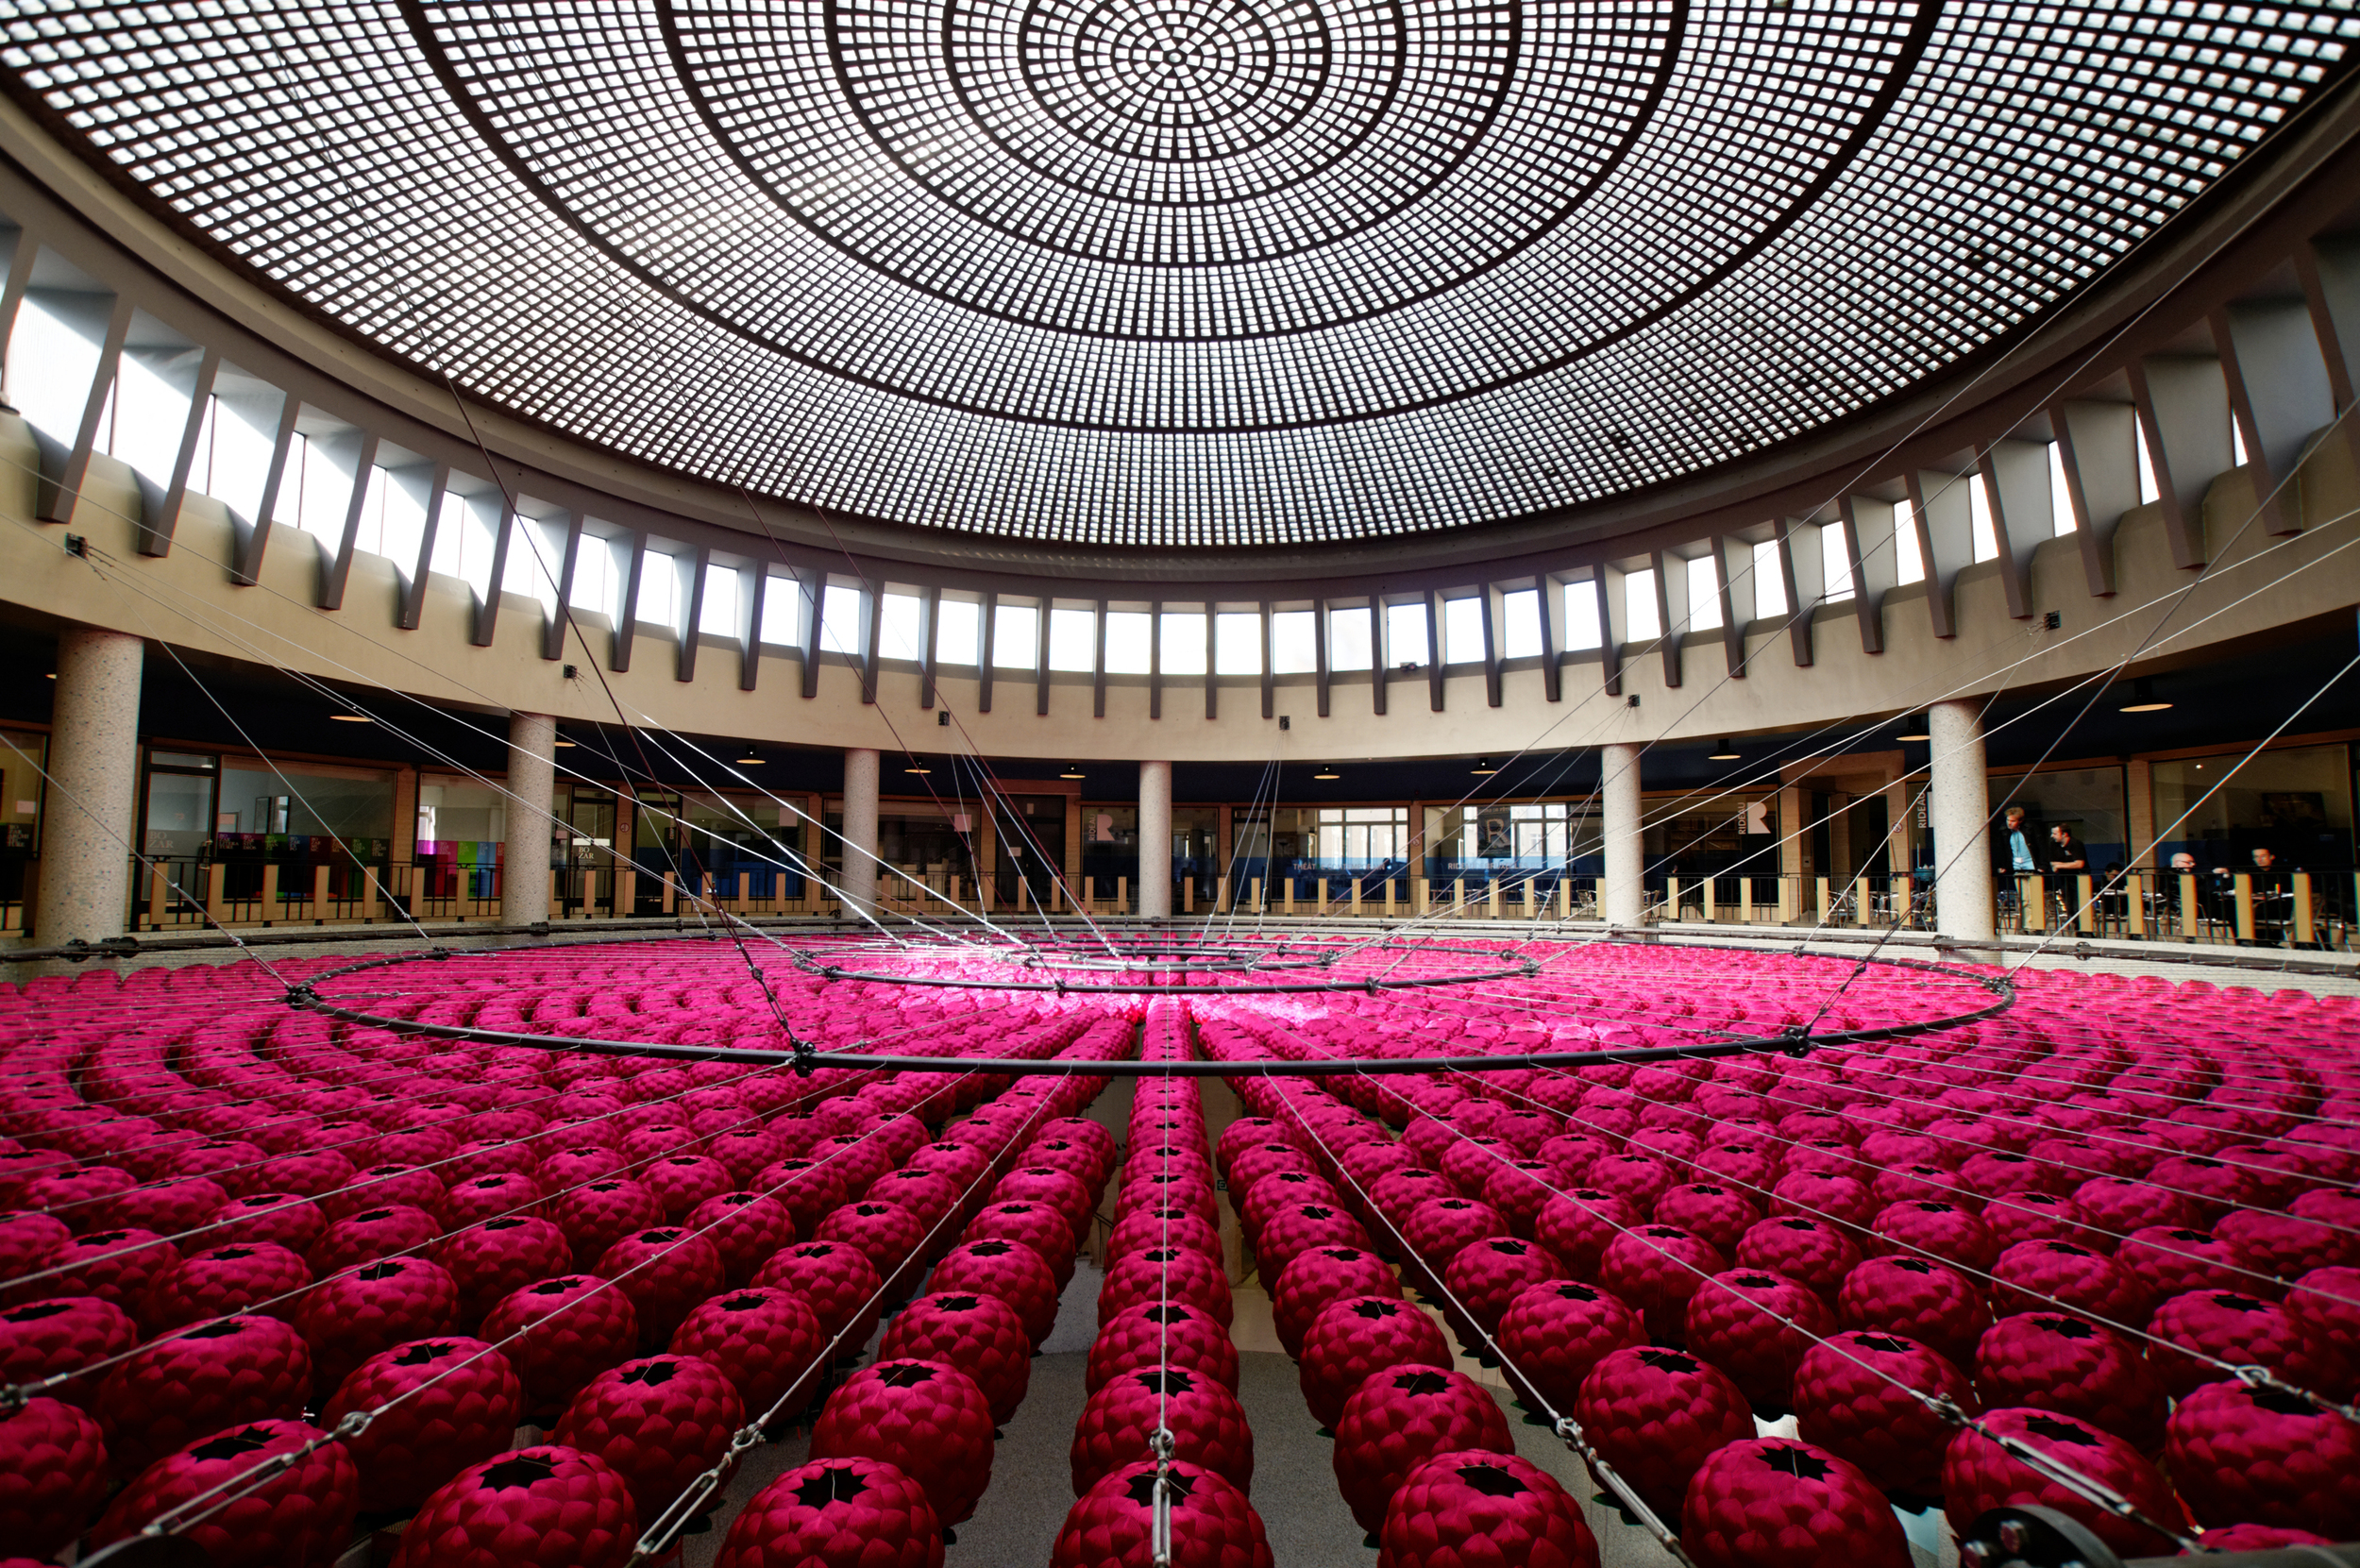 "Kimsooja, ""Lotus: Zone of Zero"", Installation in the Rotunda at Galerie Ravenstein, Brussels, 2008. Image courtesy Dijon Consortium."